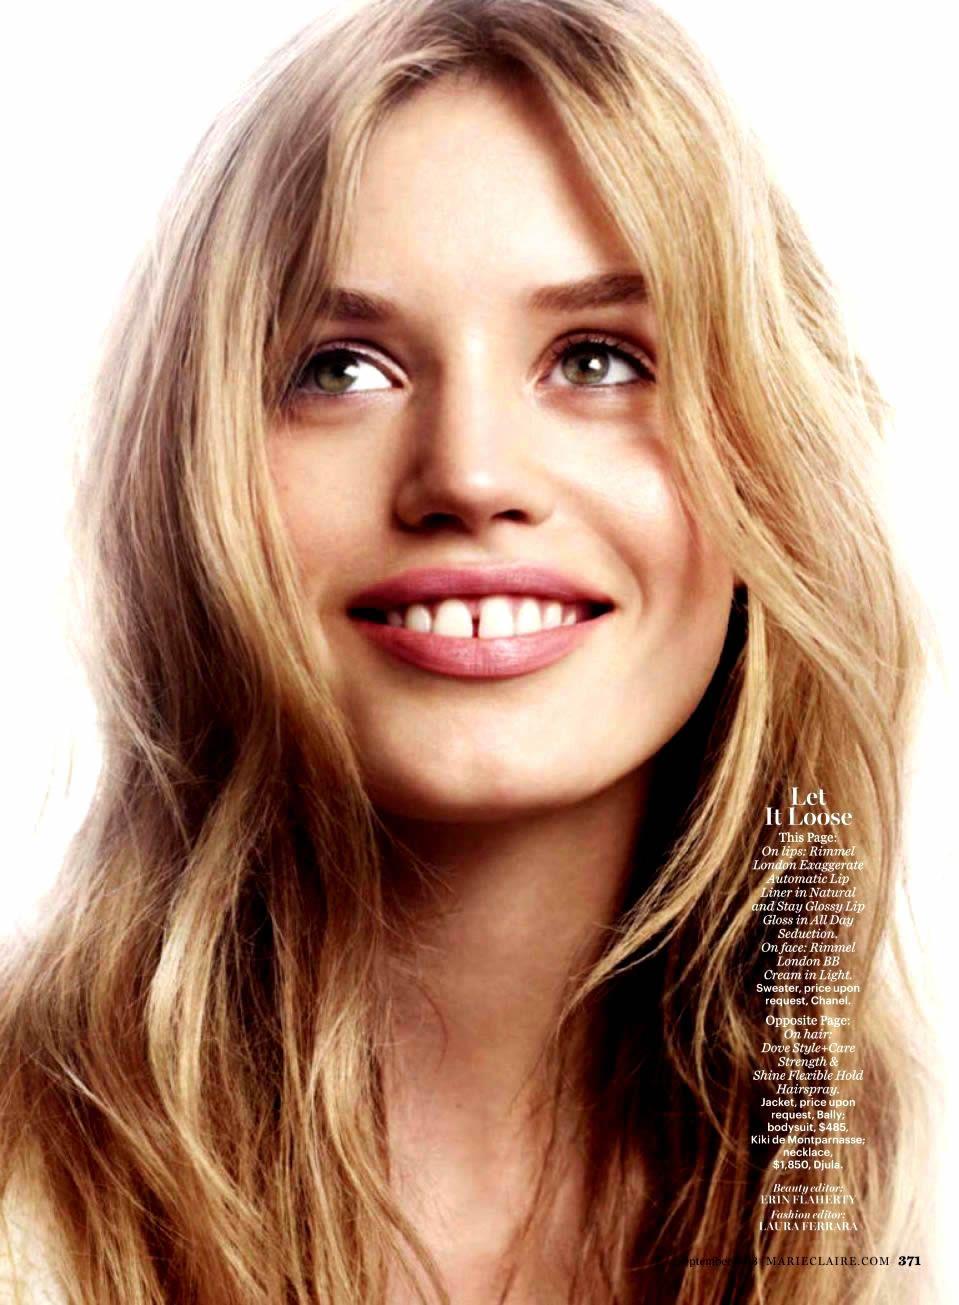 I Love Models With Teeth Gaps Theyre So Prettyrandom Fact